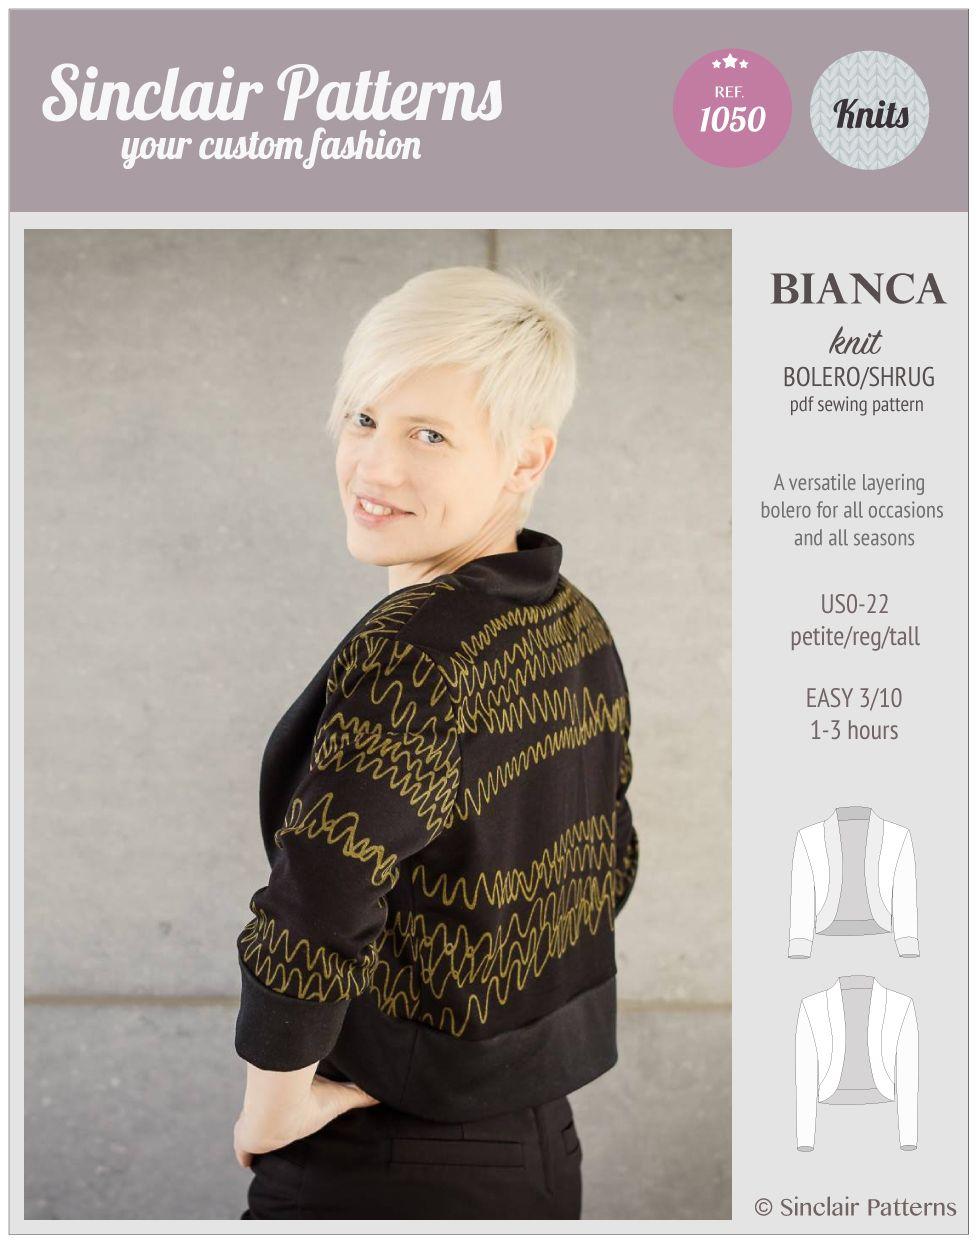 PDF Sewing Patterns Sinclair Patterns Bianca knit bolero/shrug (PDF ...